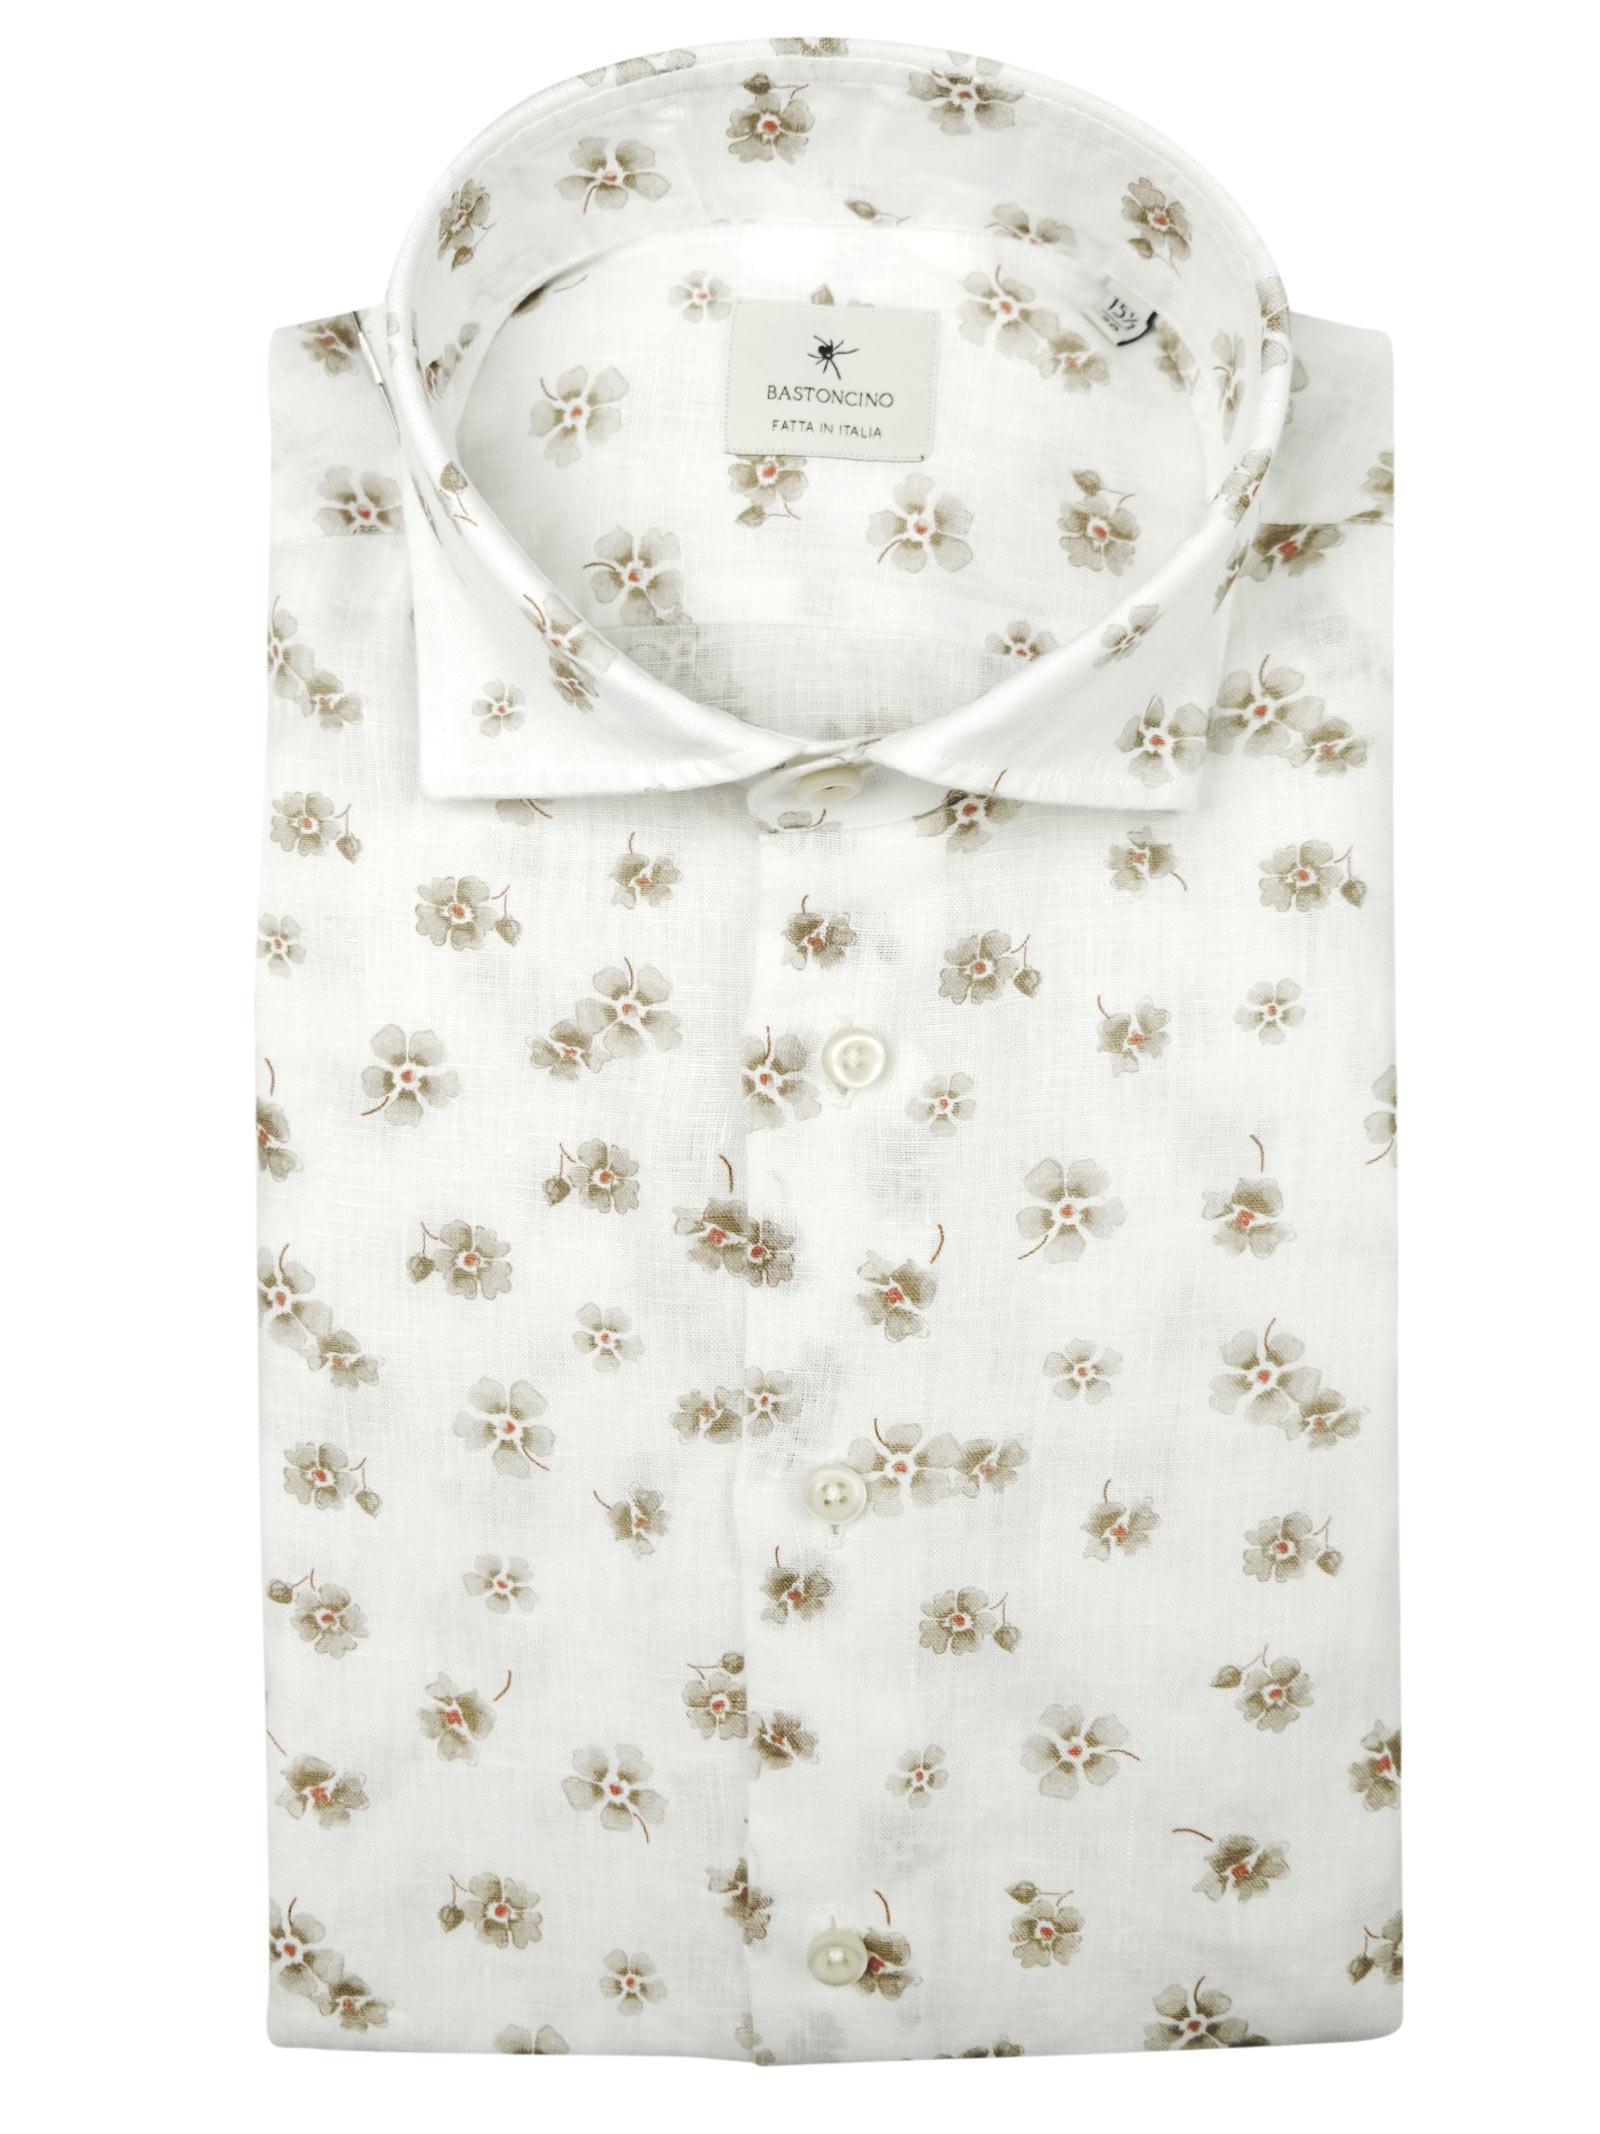 Casual shirt BASTONCINO | Shirts | SARTORIALE1857 2 L